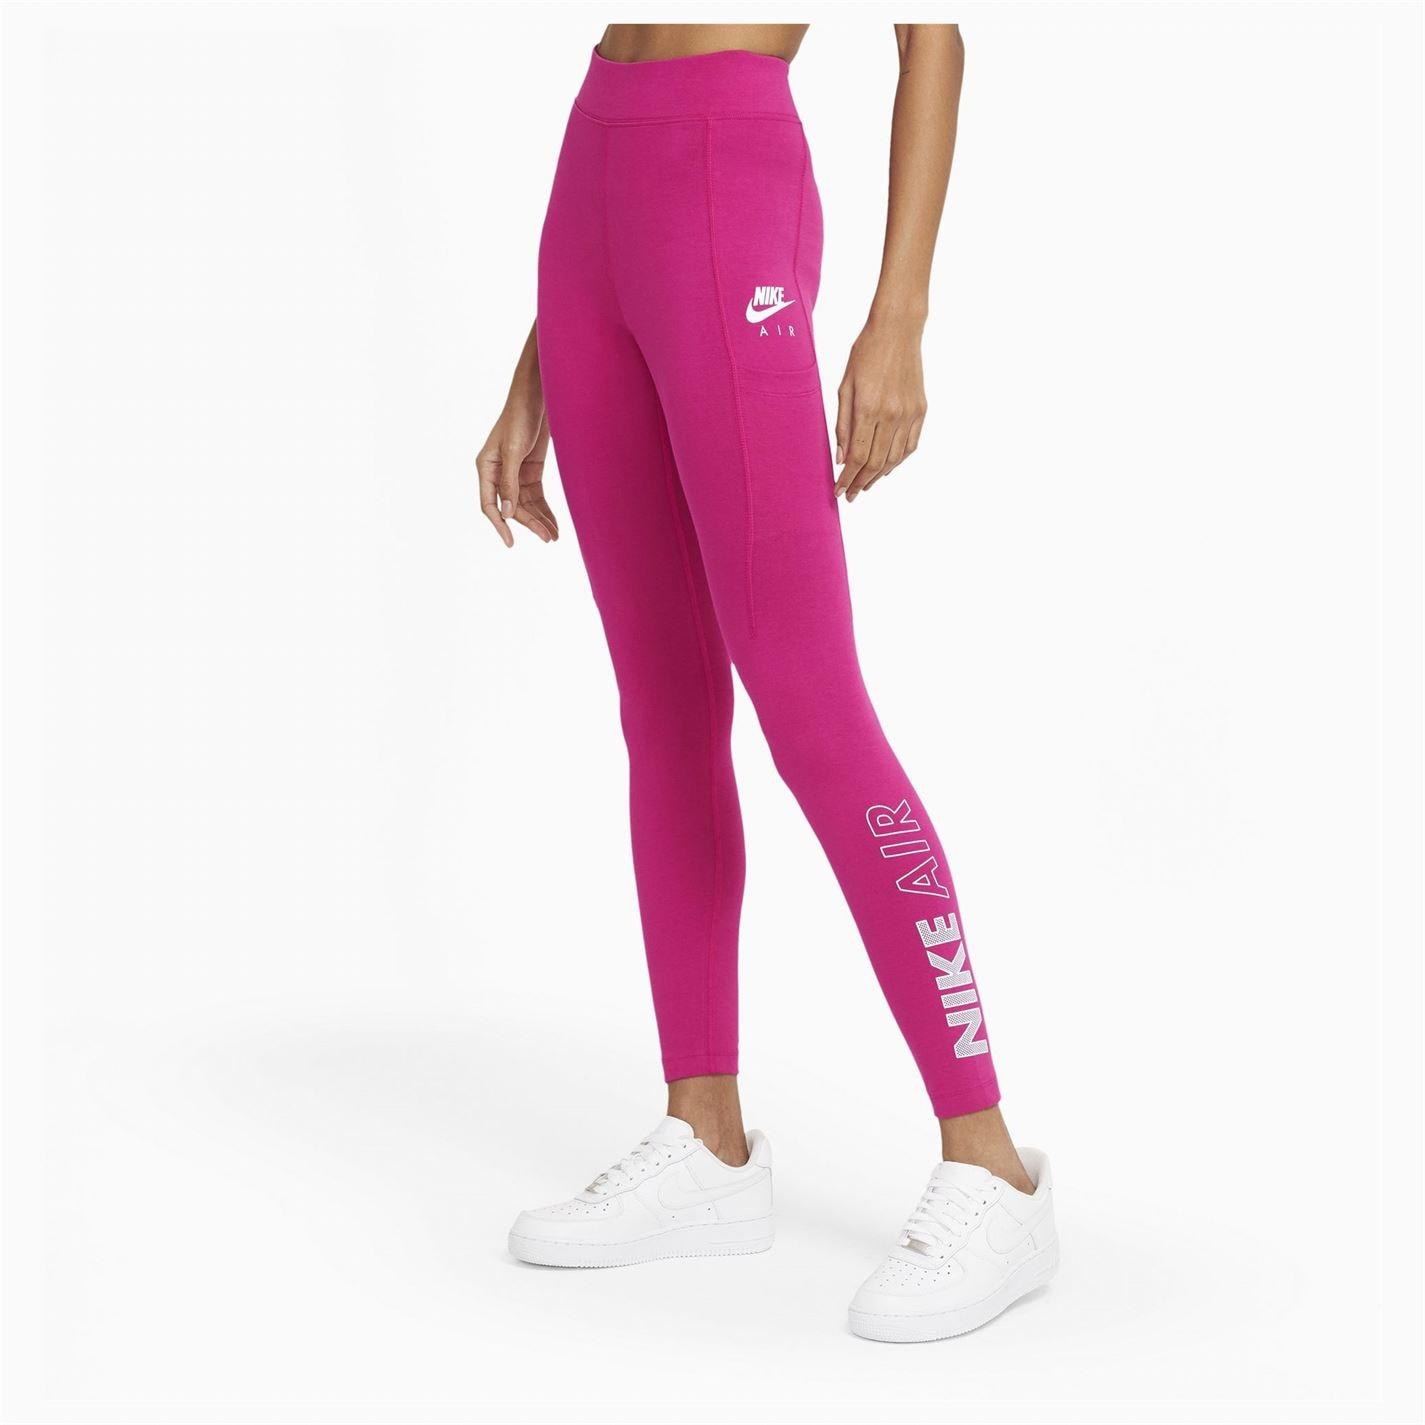 Mergi la Colanti Nike Air pentru femei roz